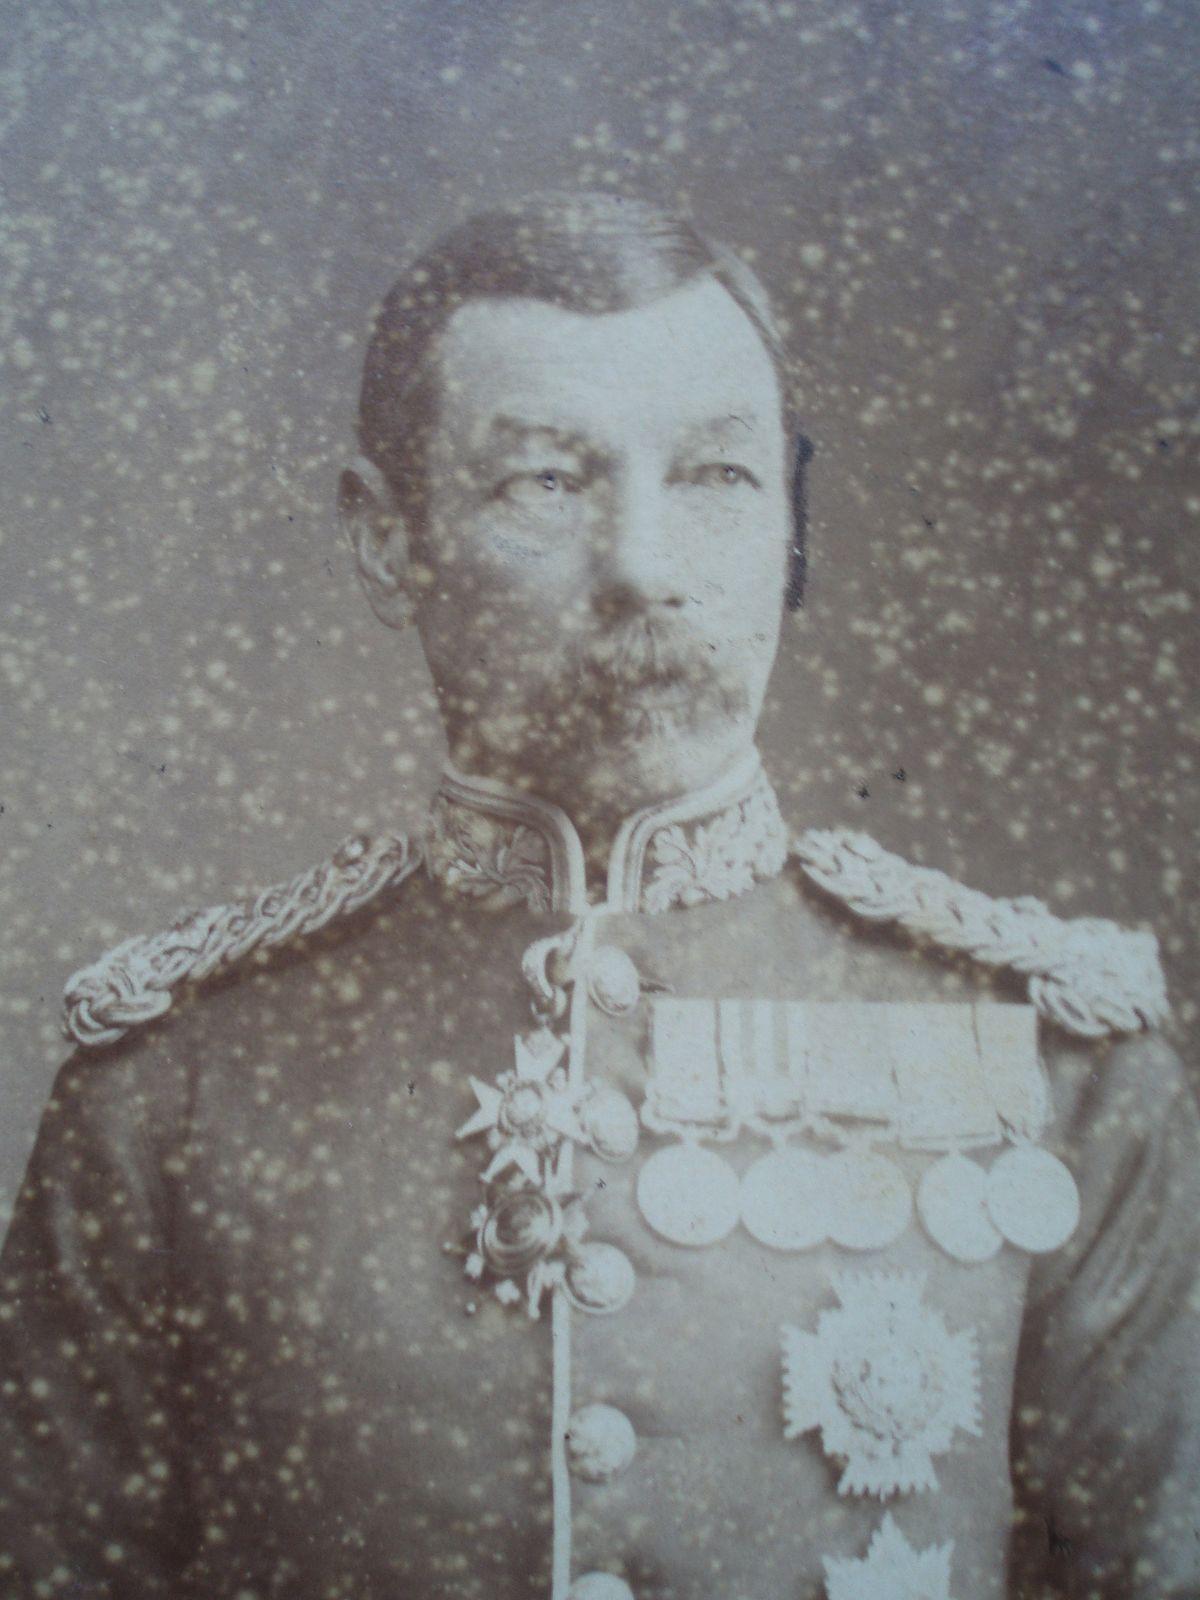 Drury Drury Lowe Wikipedia